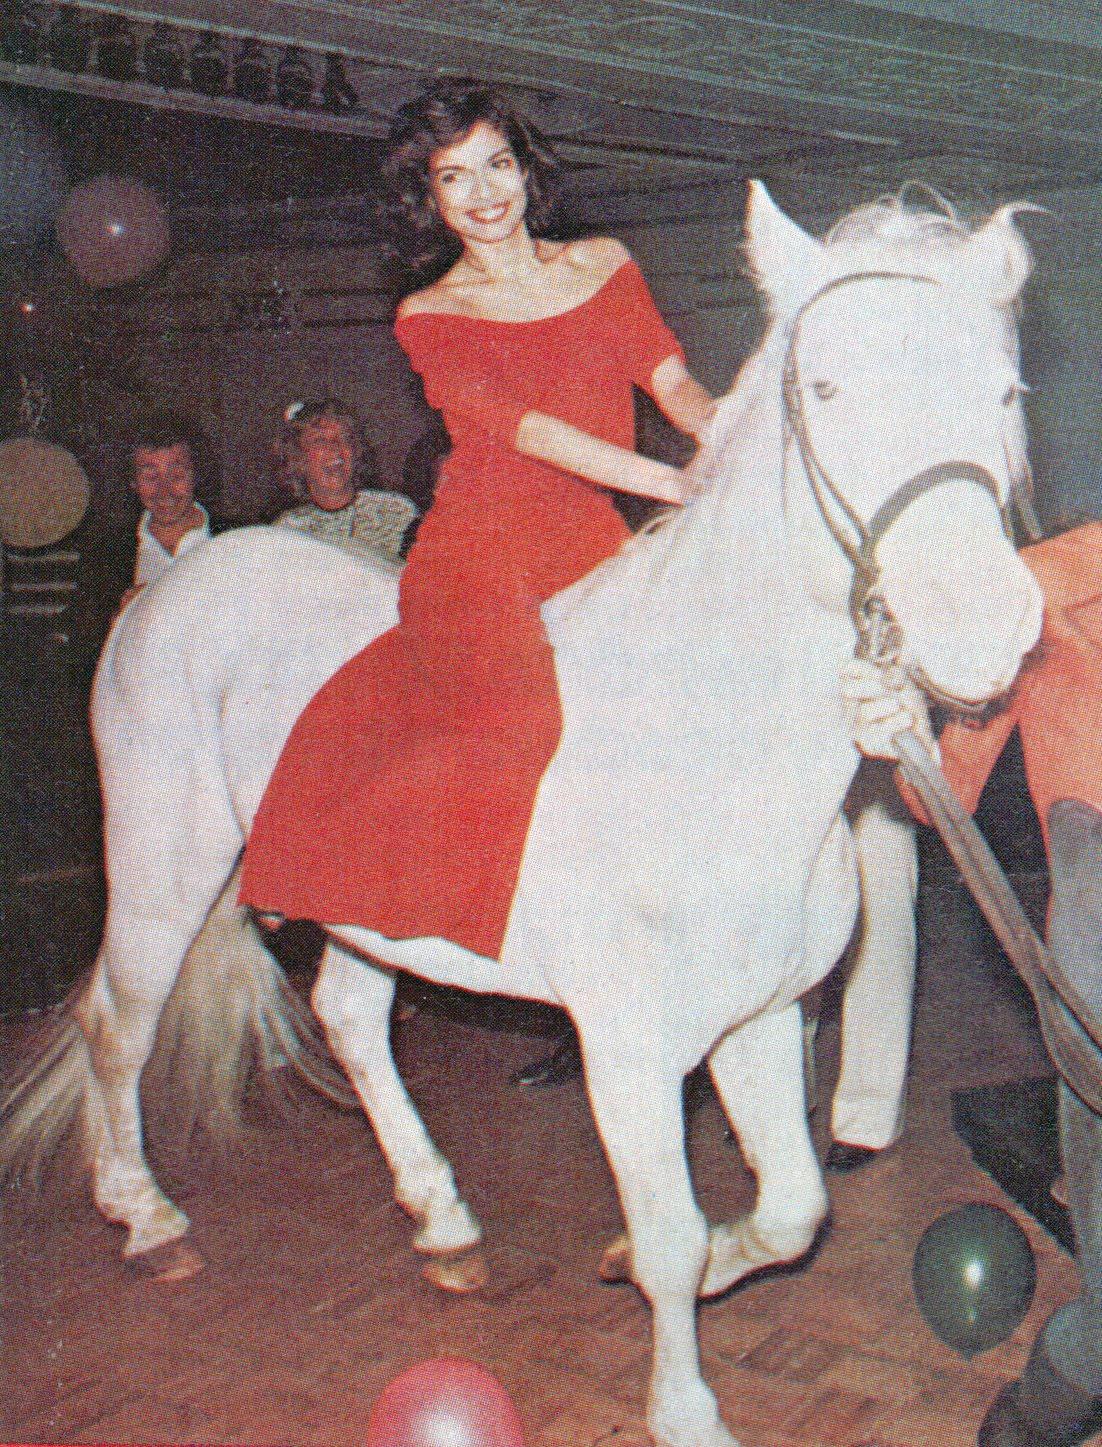 bianca jagger horse studio 54 halston